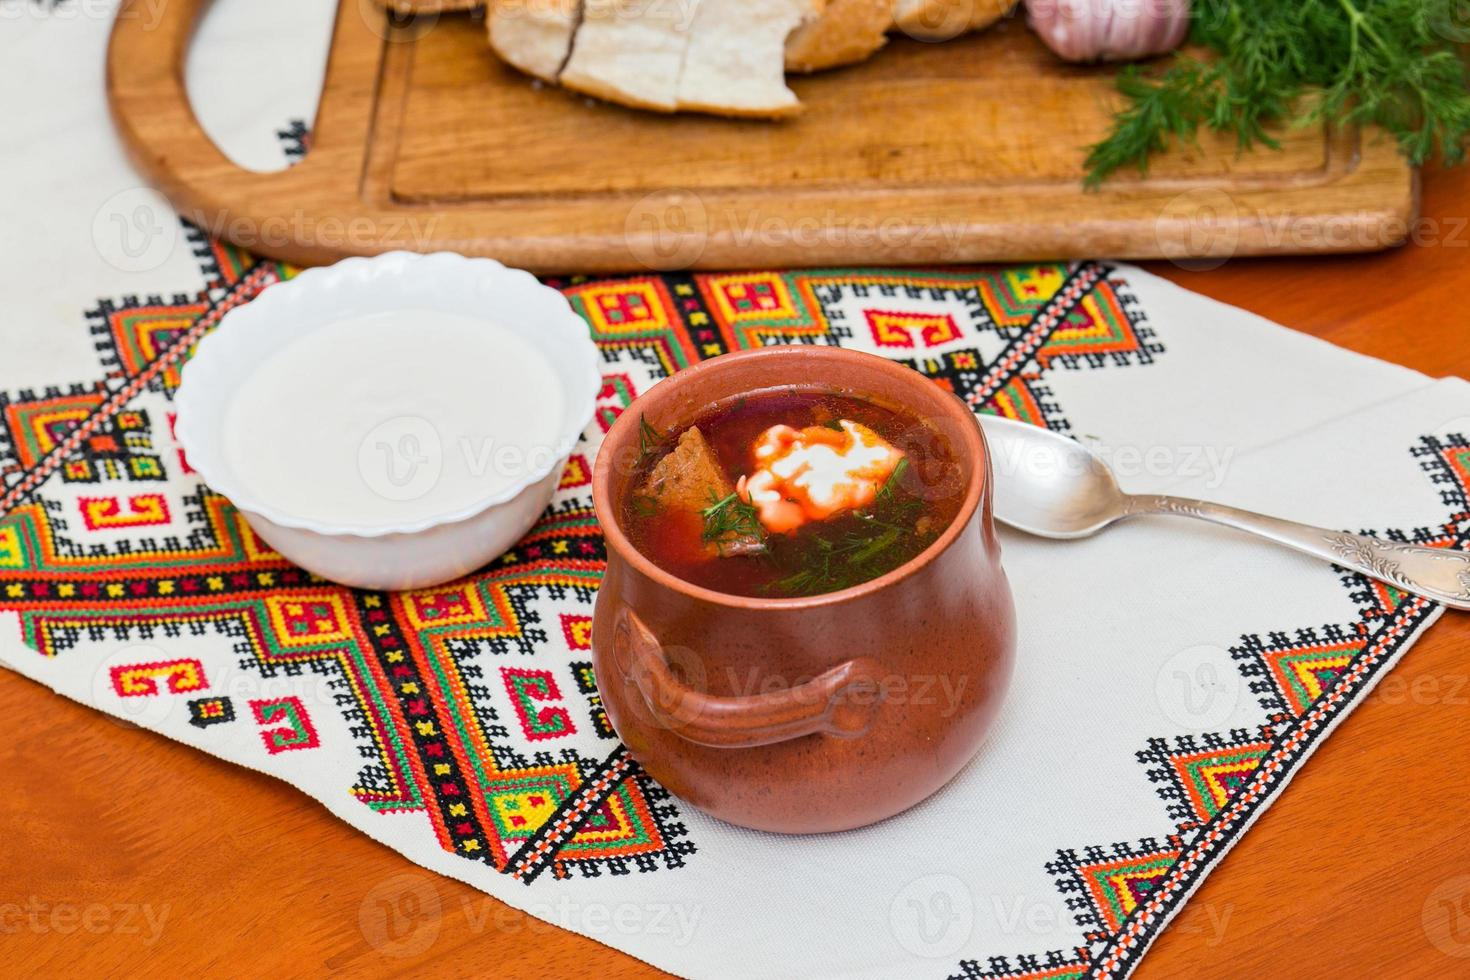 Ukrainian borsch and a bowl of sour cream photo